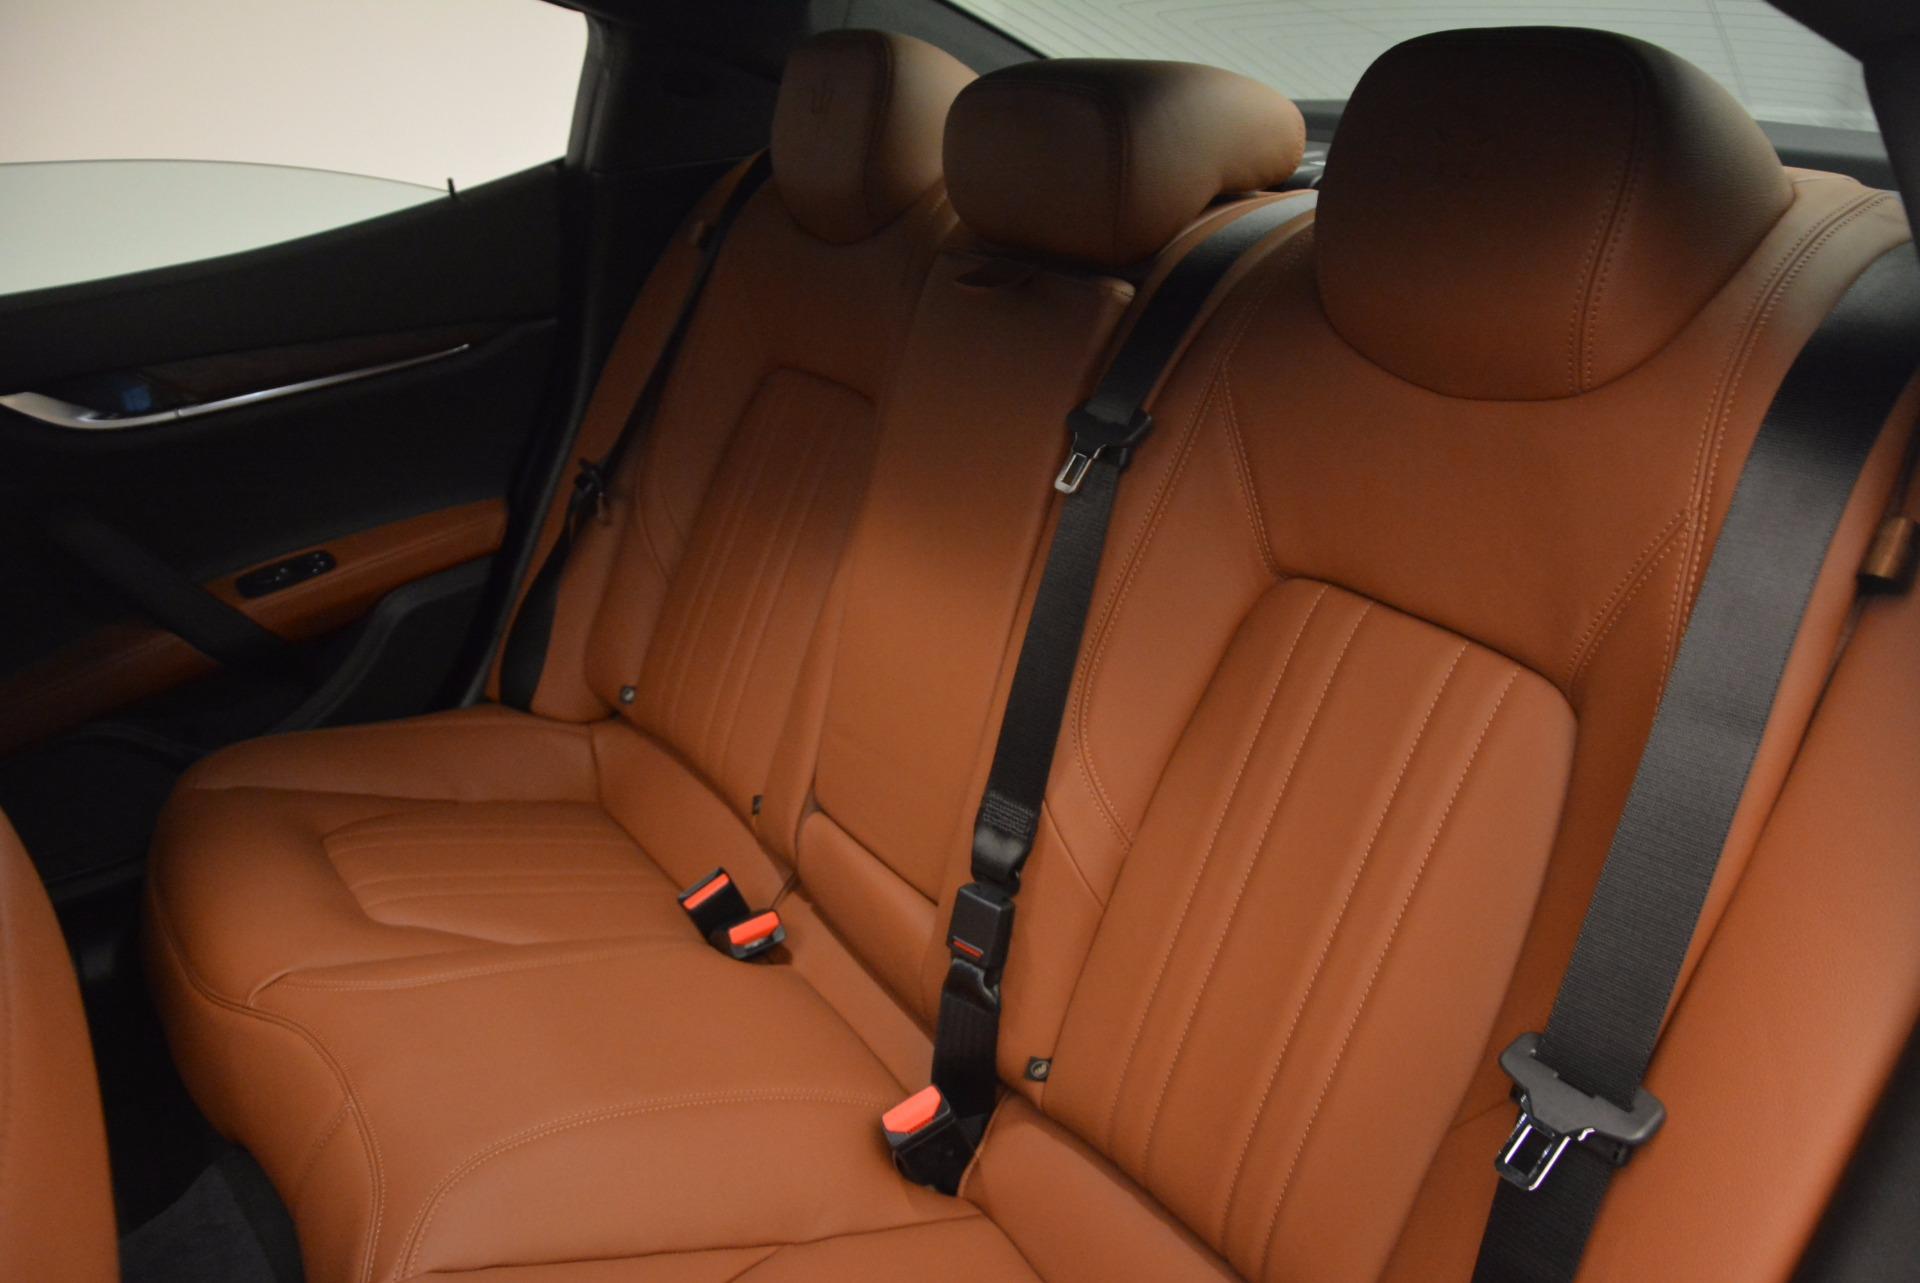 Used 2017 Maserati Ghibli S Q4 Ex-Loaner For Sale In Greenwich, CT 1166_p18